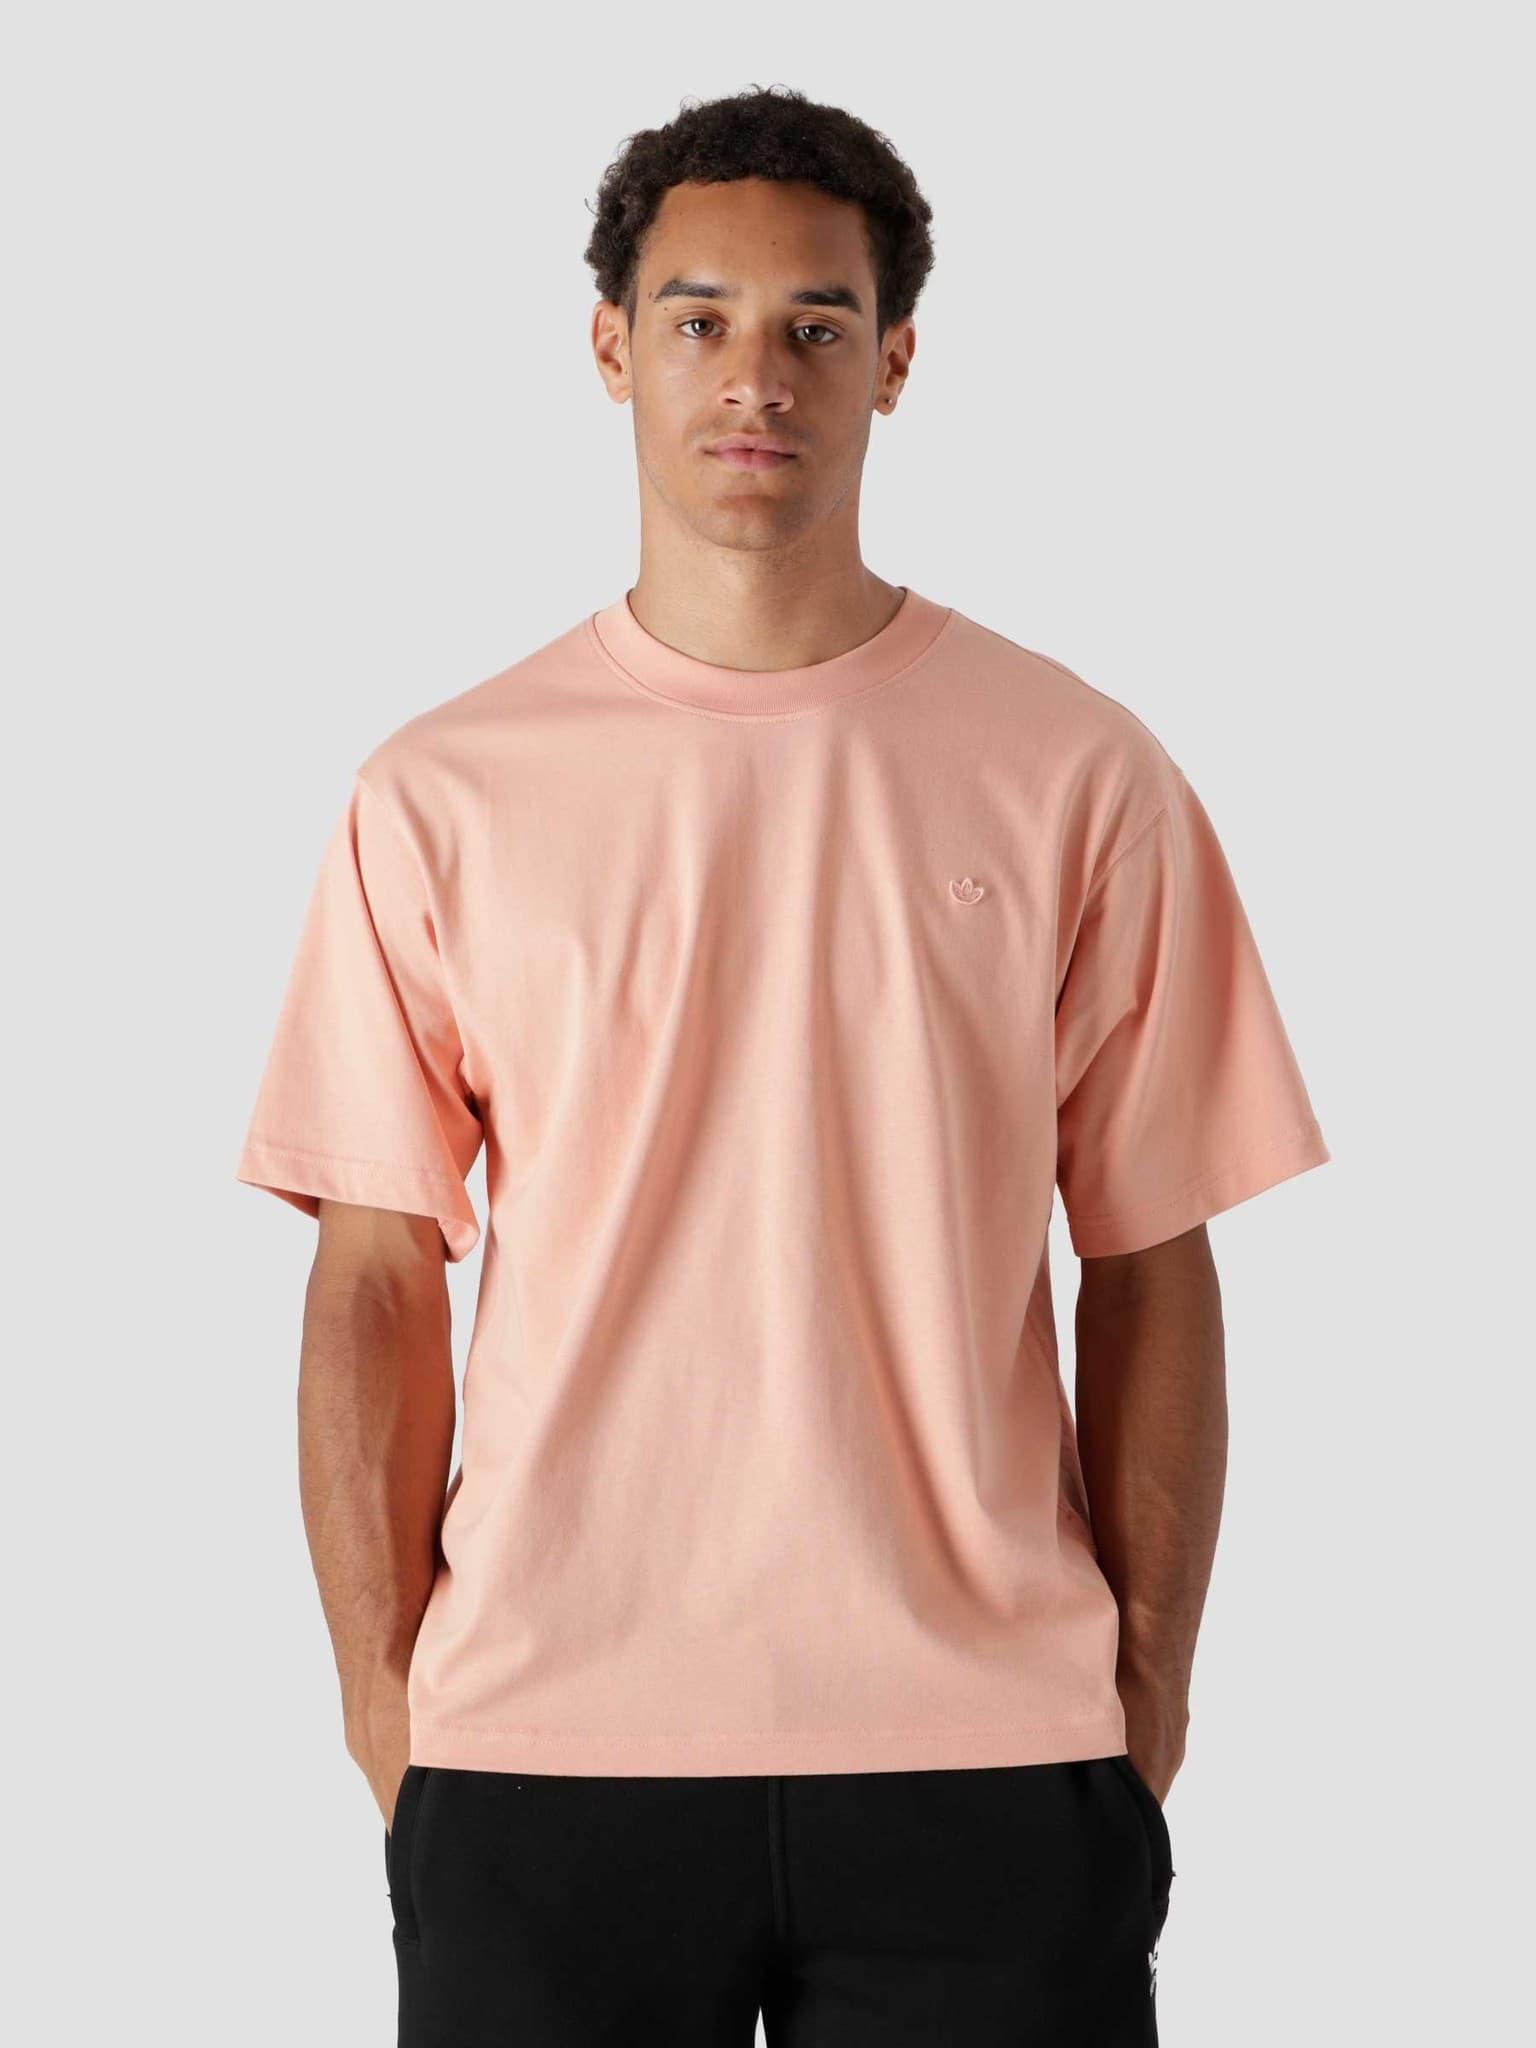 C T-Shirt Ambient Blush H11366